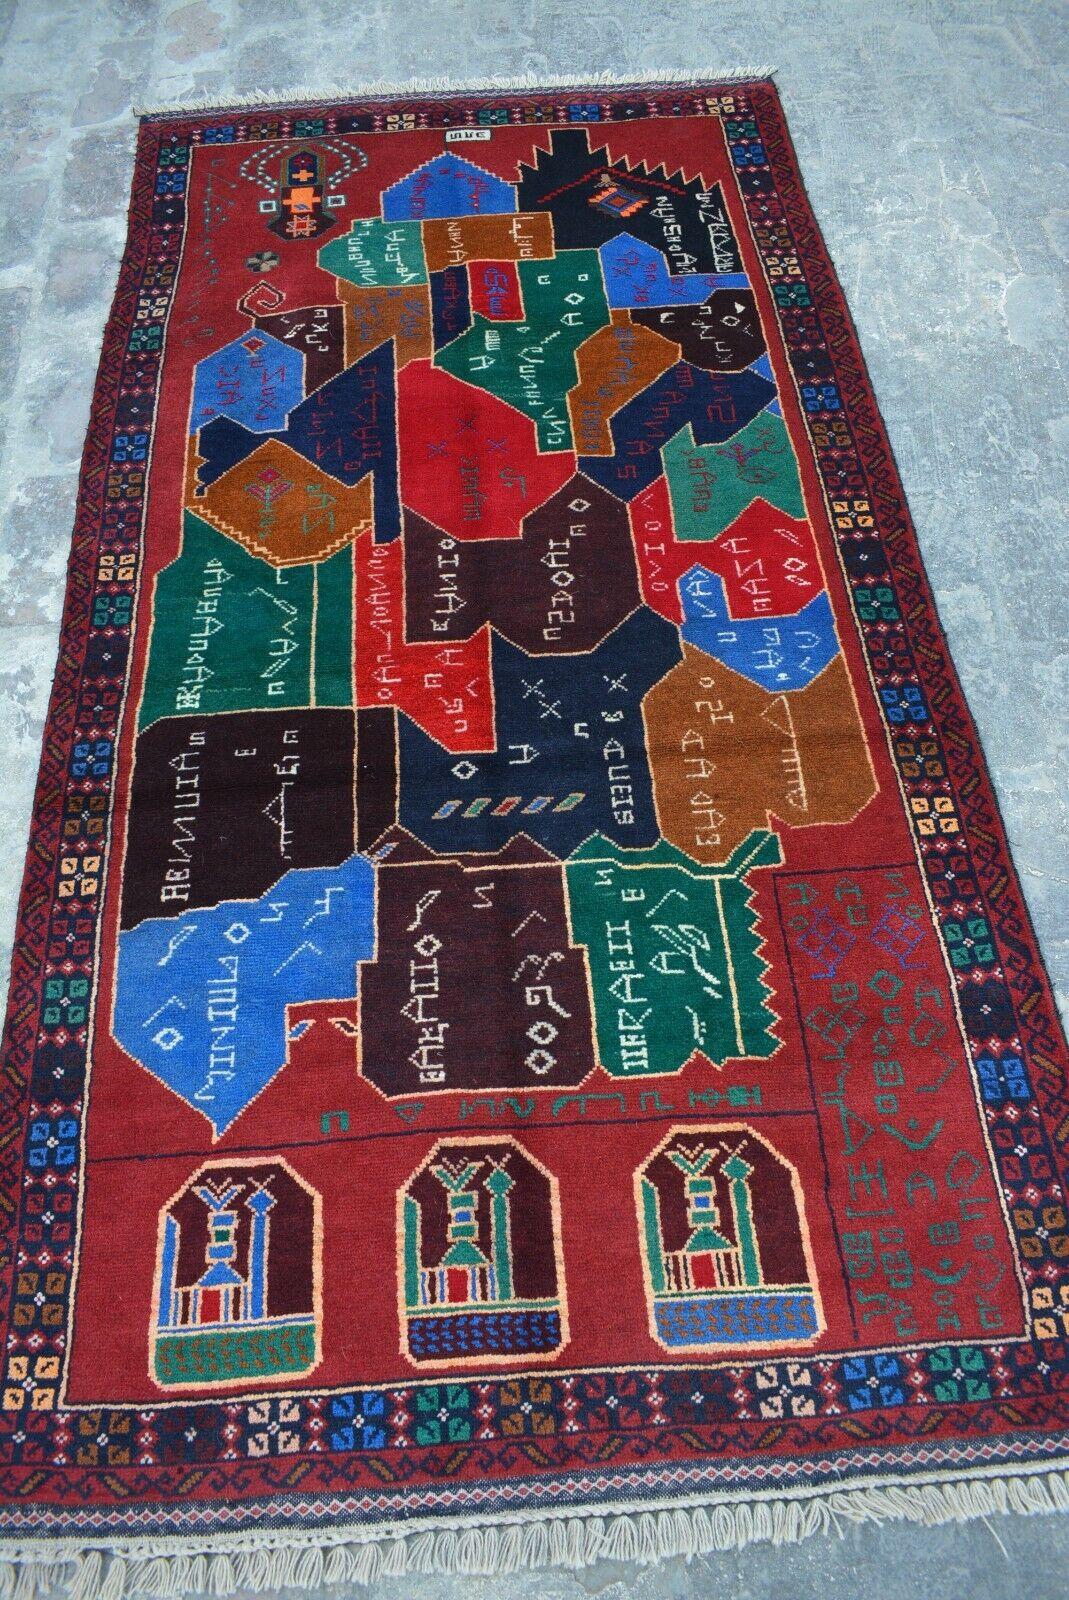 F894 Gorgeous Handmade Afghan Tribal Map Rug   Afghan Rug  3'7 x 6'10 Feet